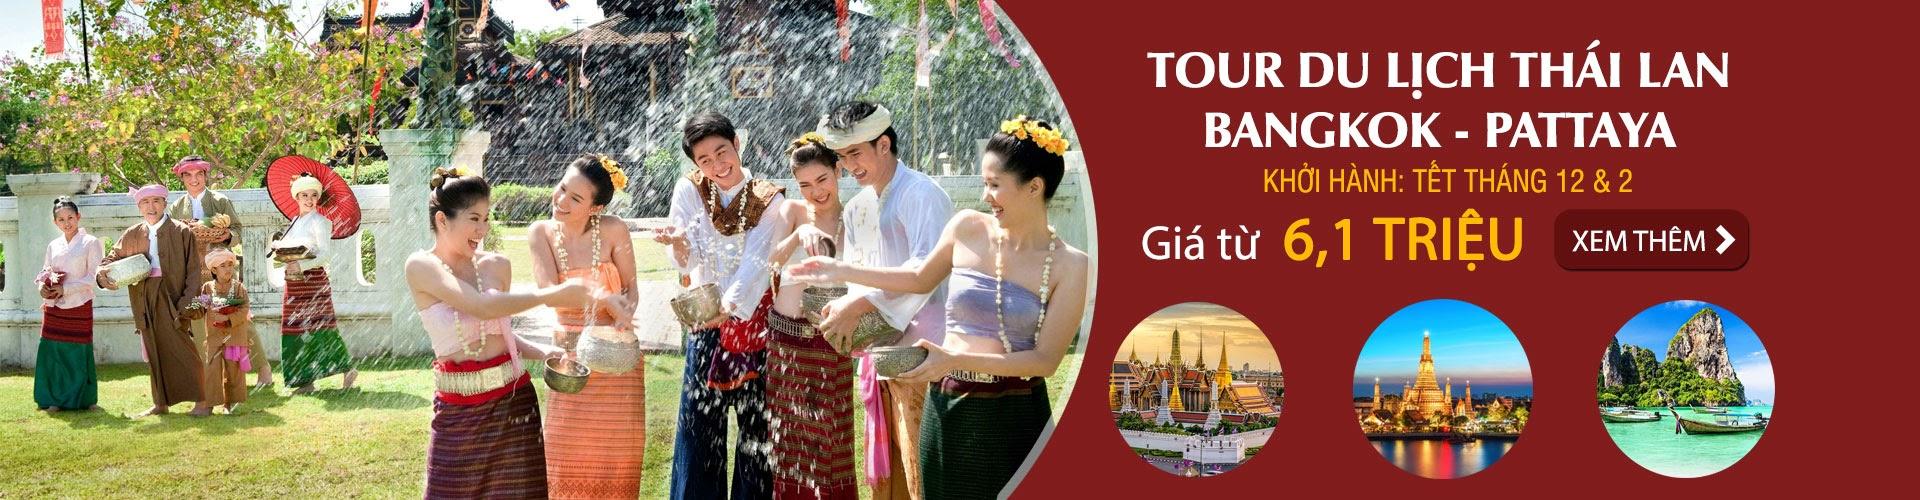 tour du lịch thái lan bangkok pattaya tết 2018